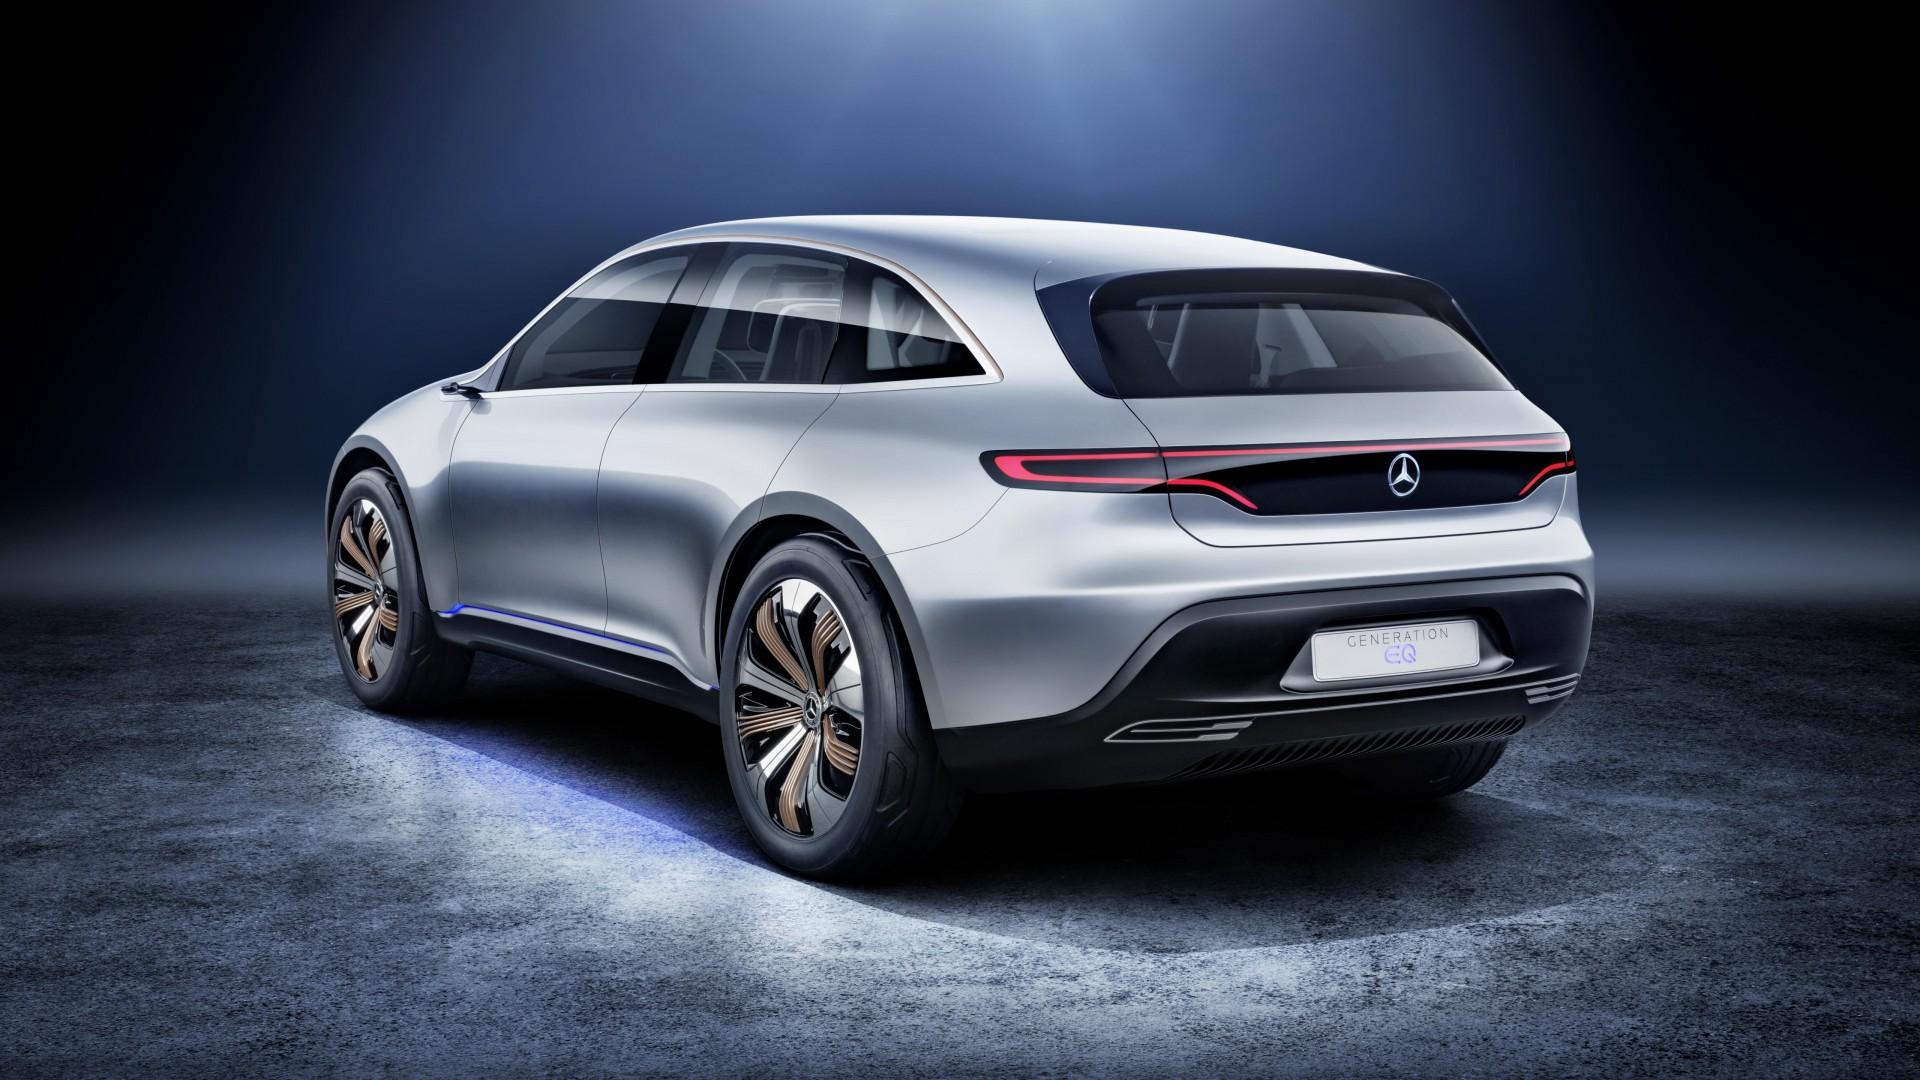 Top Class 3d Wallpapers Mercedes Benz Eq Electric Concept Suv 4k Wallpapers Hd